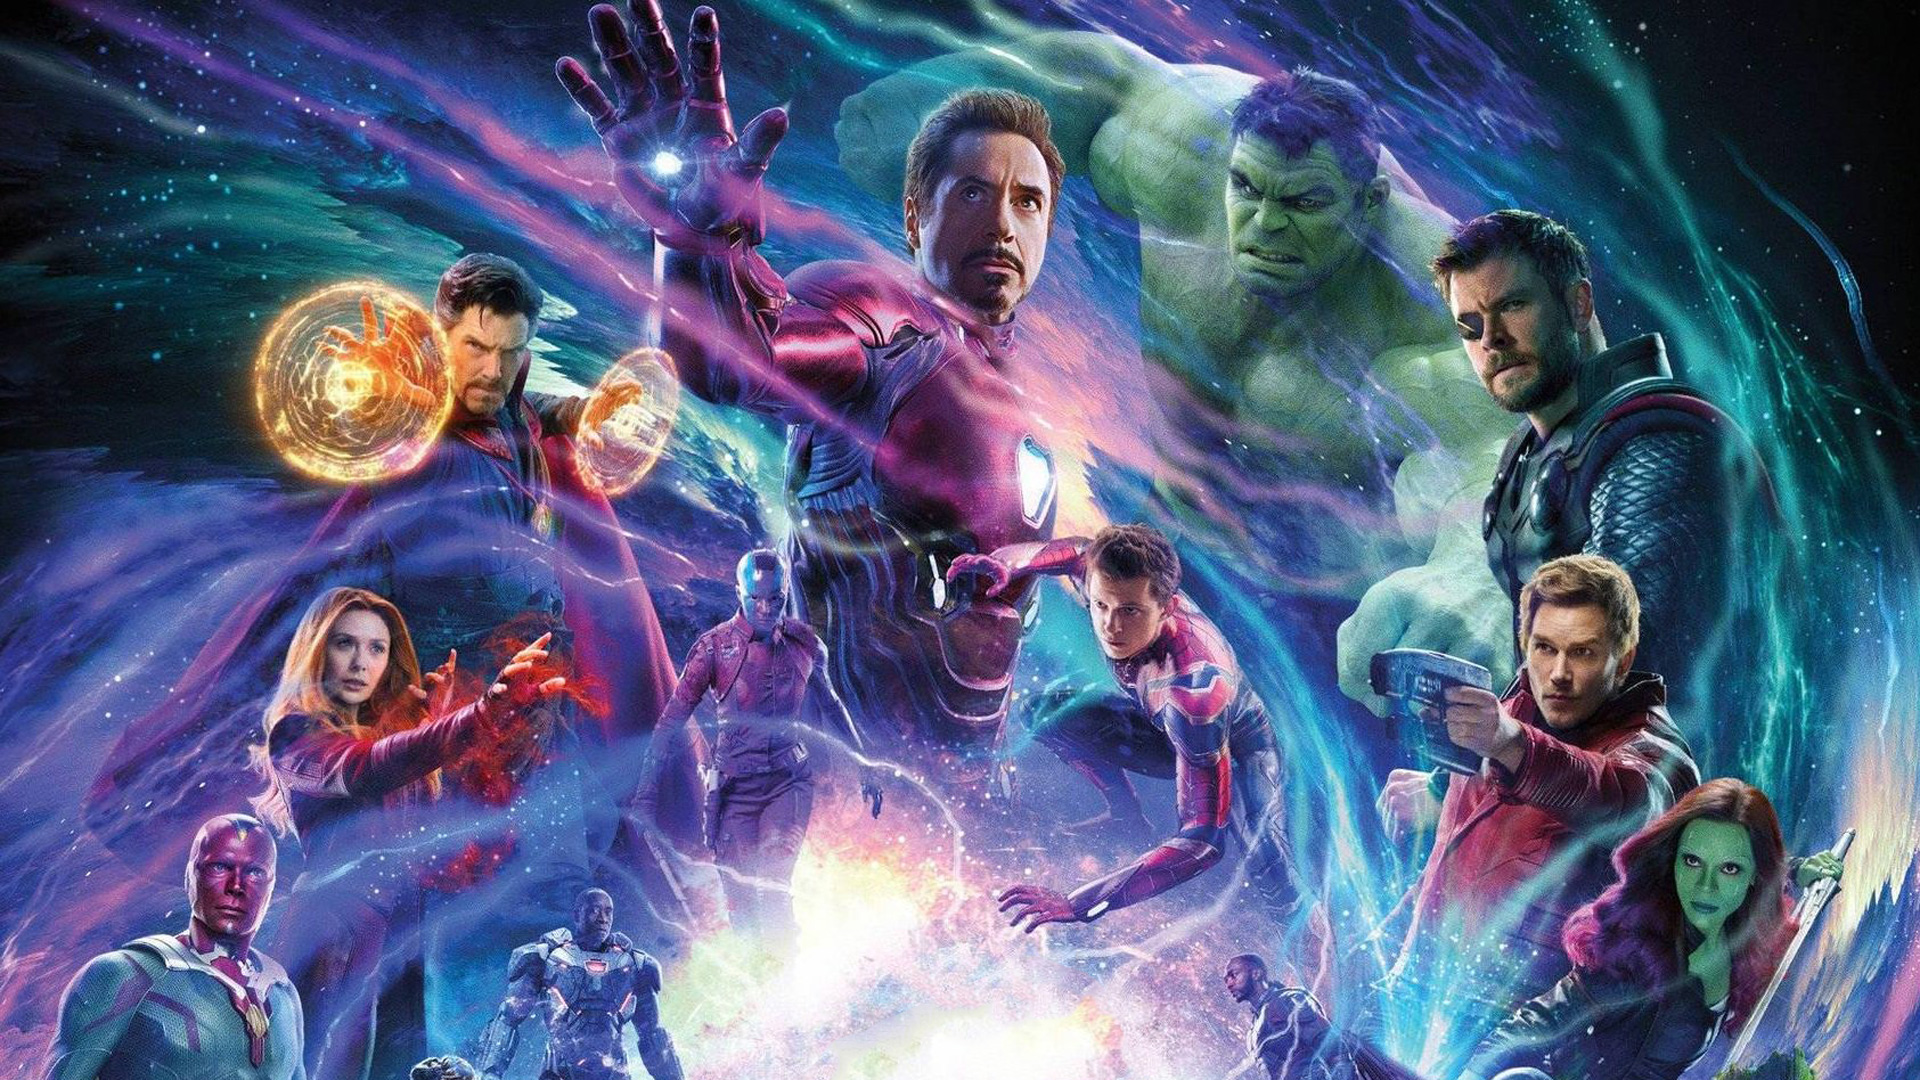 Shuri In Avengers Infinity War New Poster Hd Movies 4k: Avengers Infinity War Movie Bill Poster, HD Movies, 4k